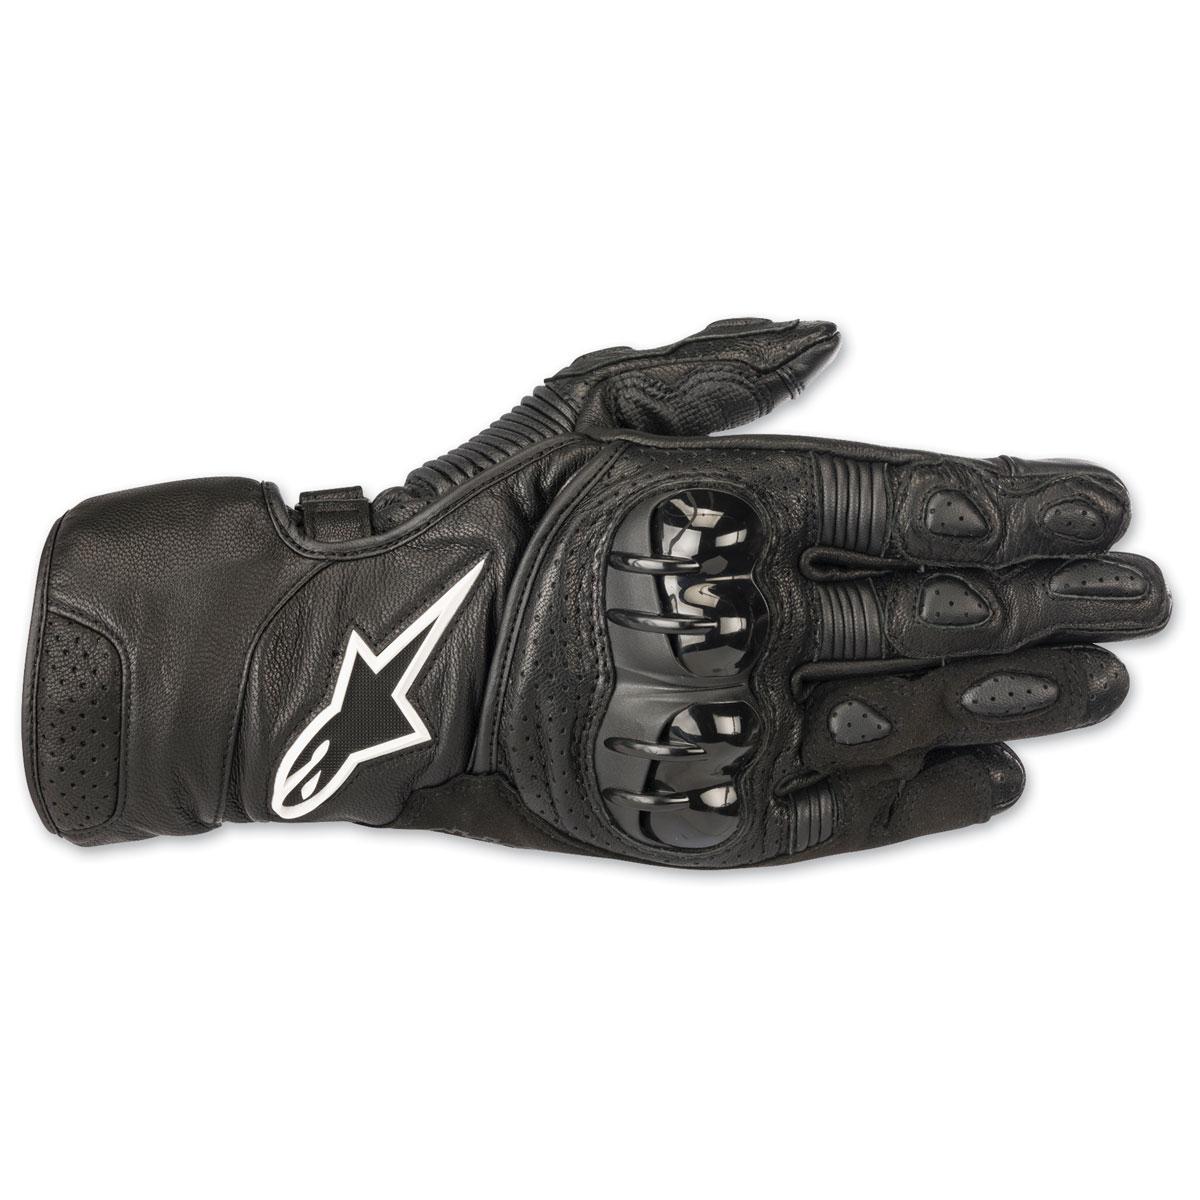 Alpinestars Men's SP-2 v2 Black Gloves